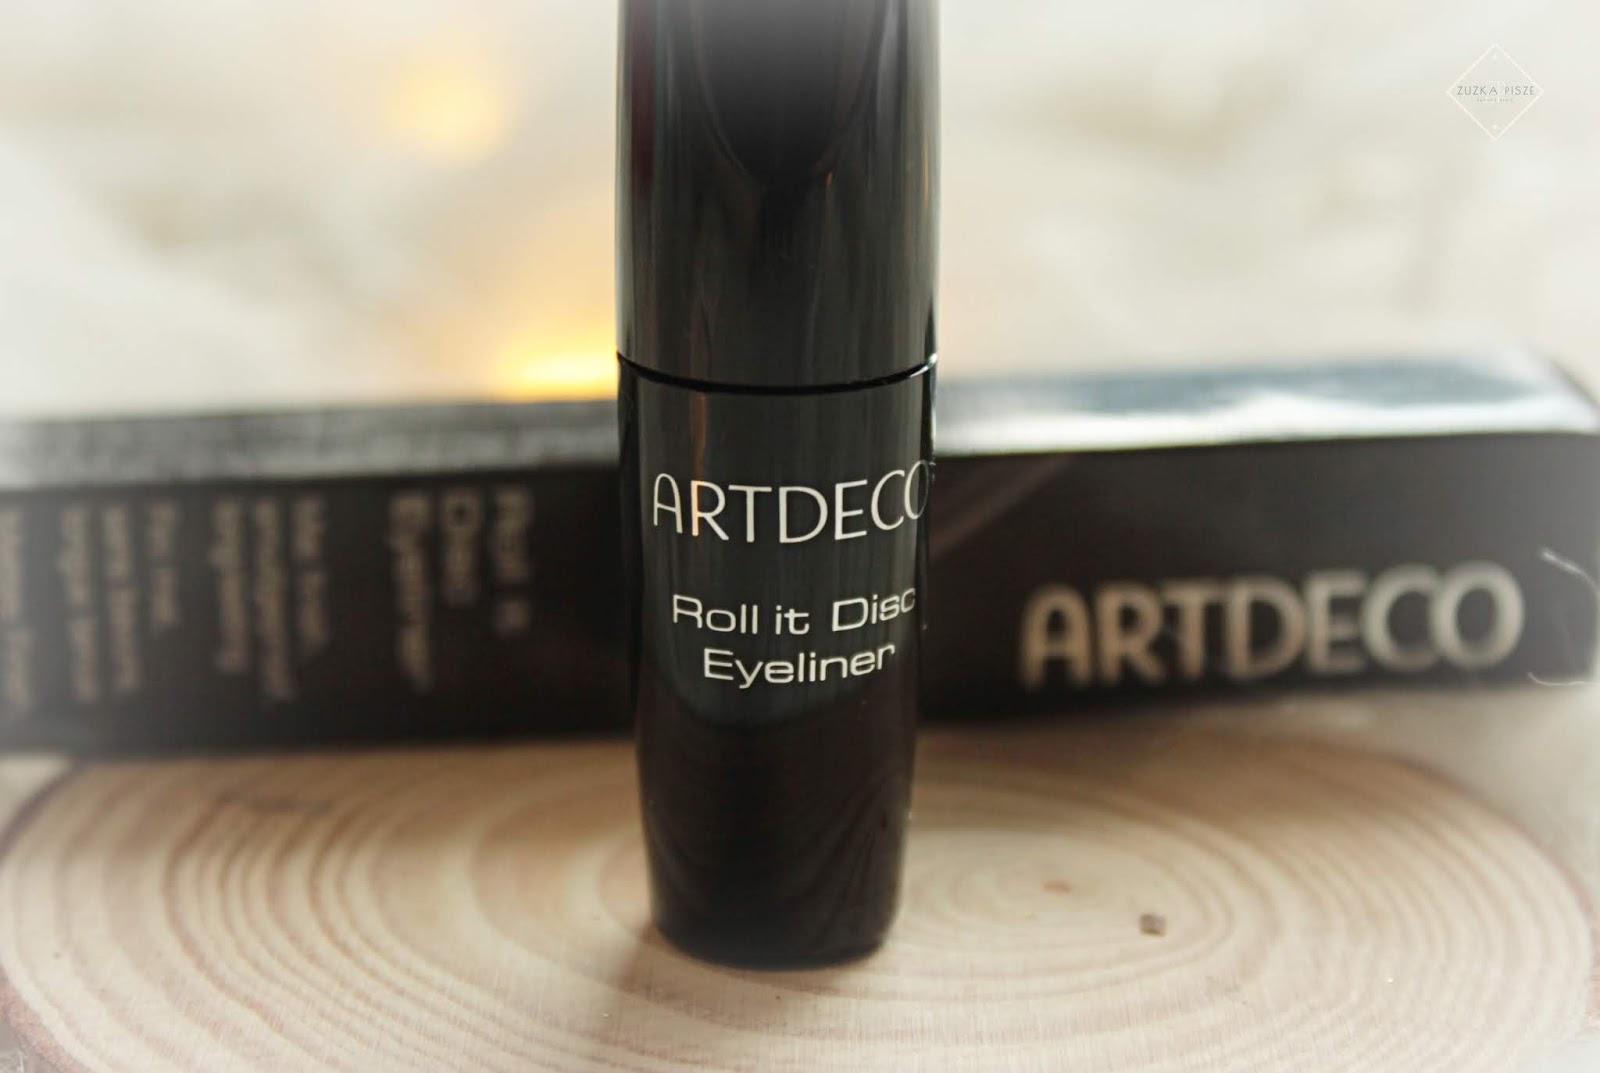 ARTDECO Roll It Disc Eyeliner